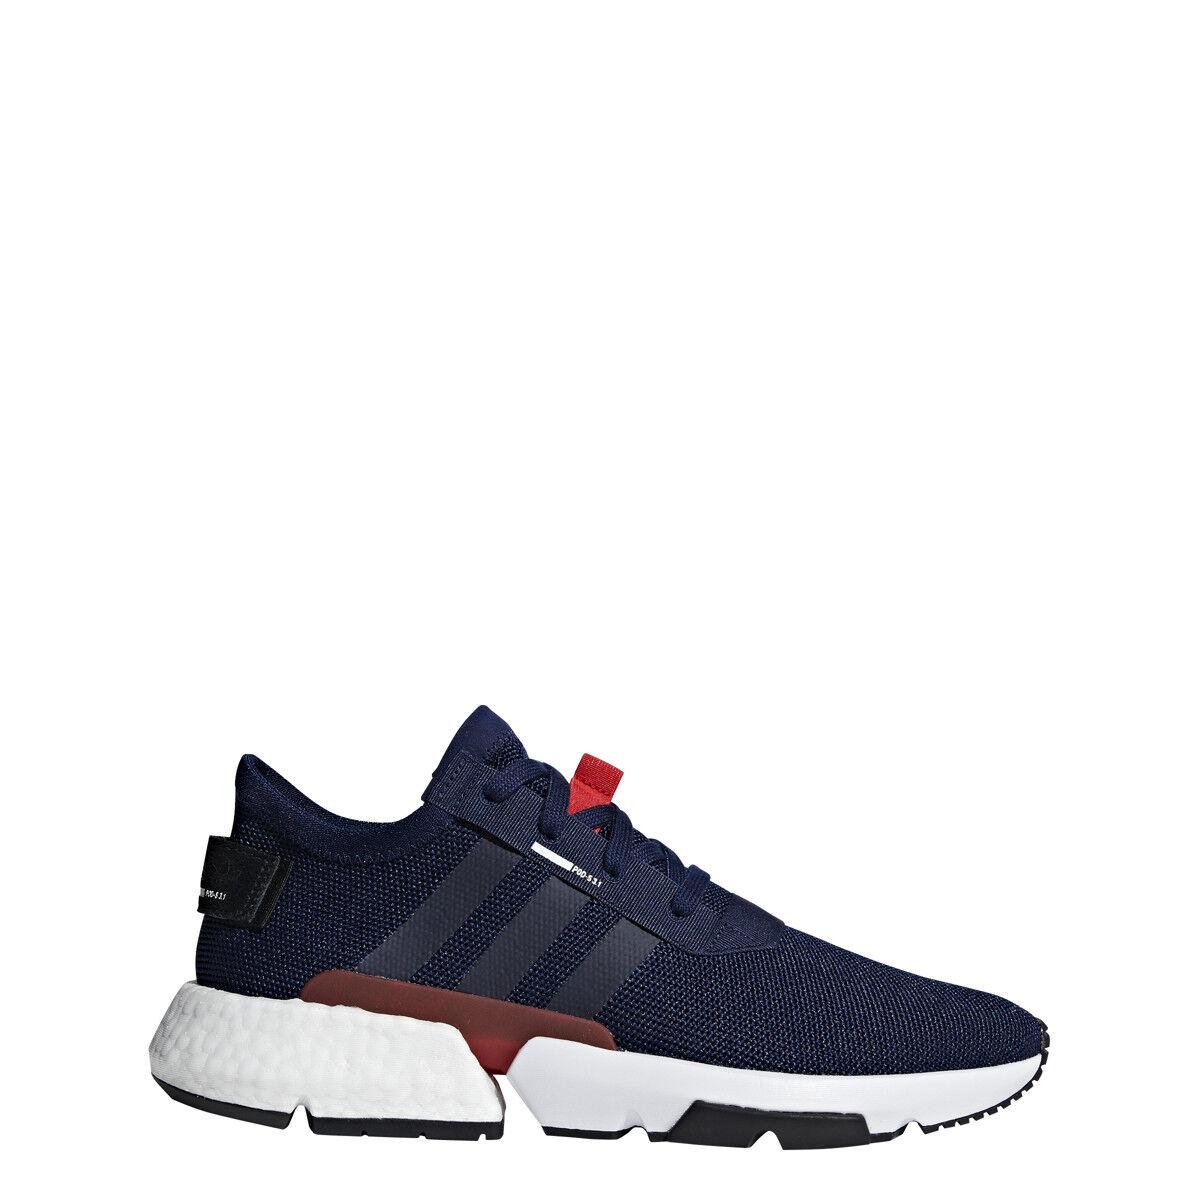 Adidas Mens POD-S3.1 bluee bluee Red - G26512